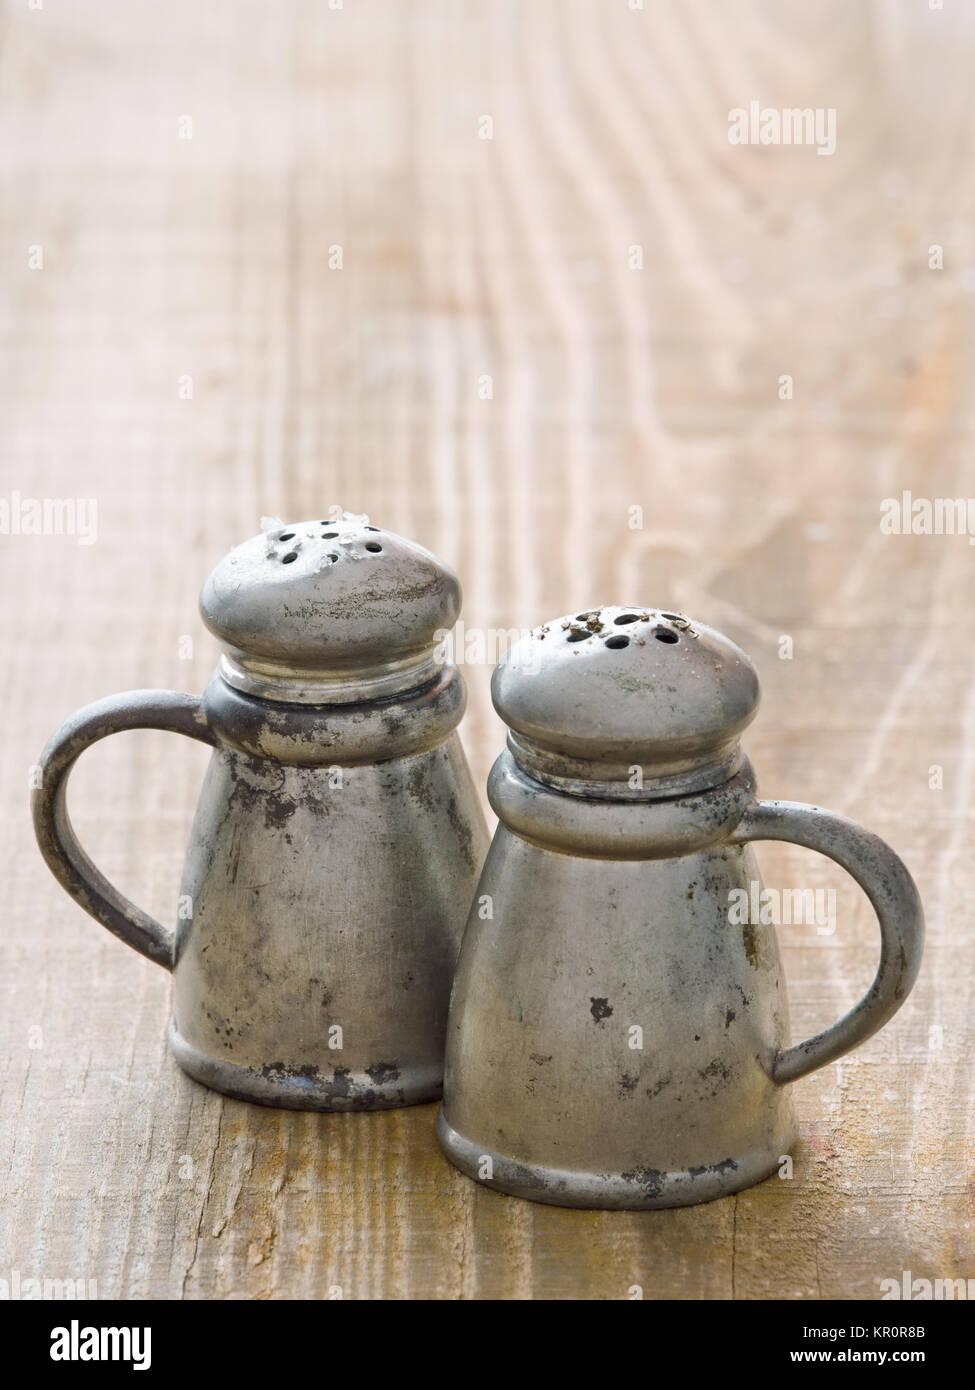 rustic salt and pepper shaker stock photo: 169048667 - alamy